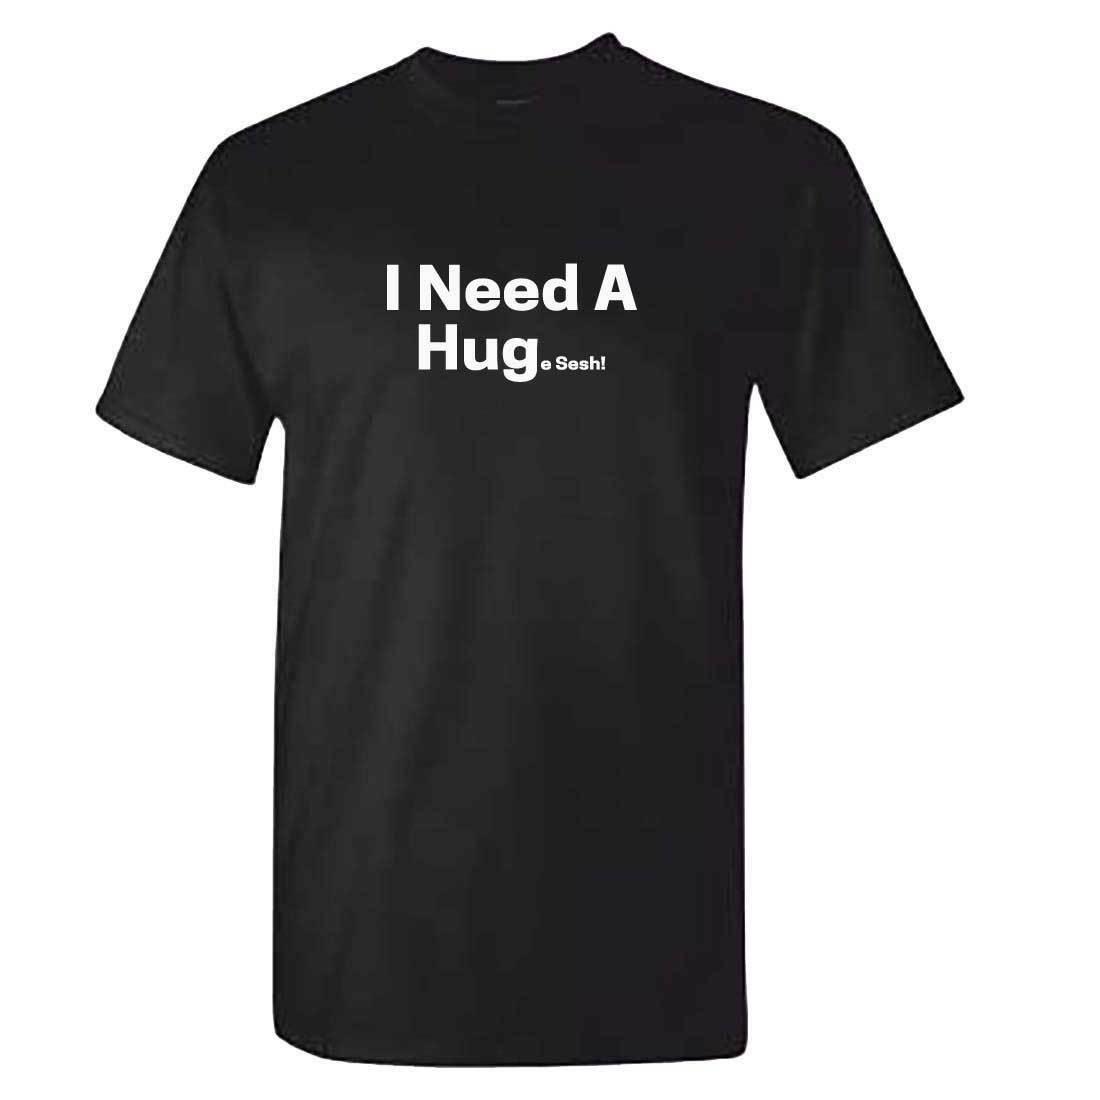 ¡Gran costura para hombre! Camiseta-divertida broma grosera maldecir-broma de tipo caliente